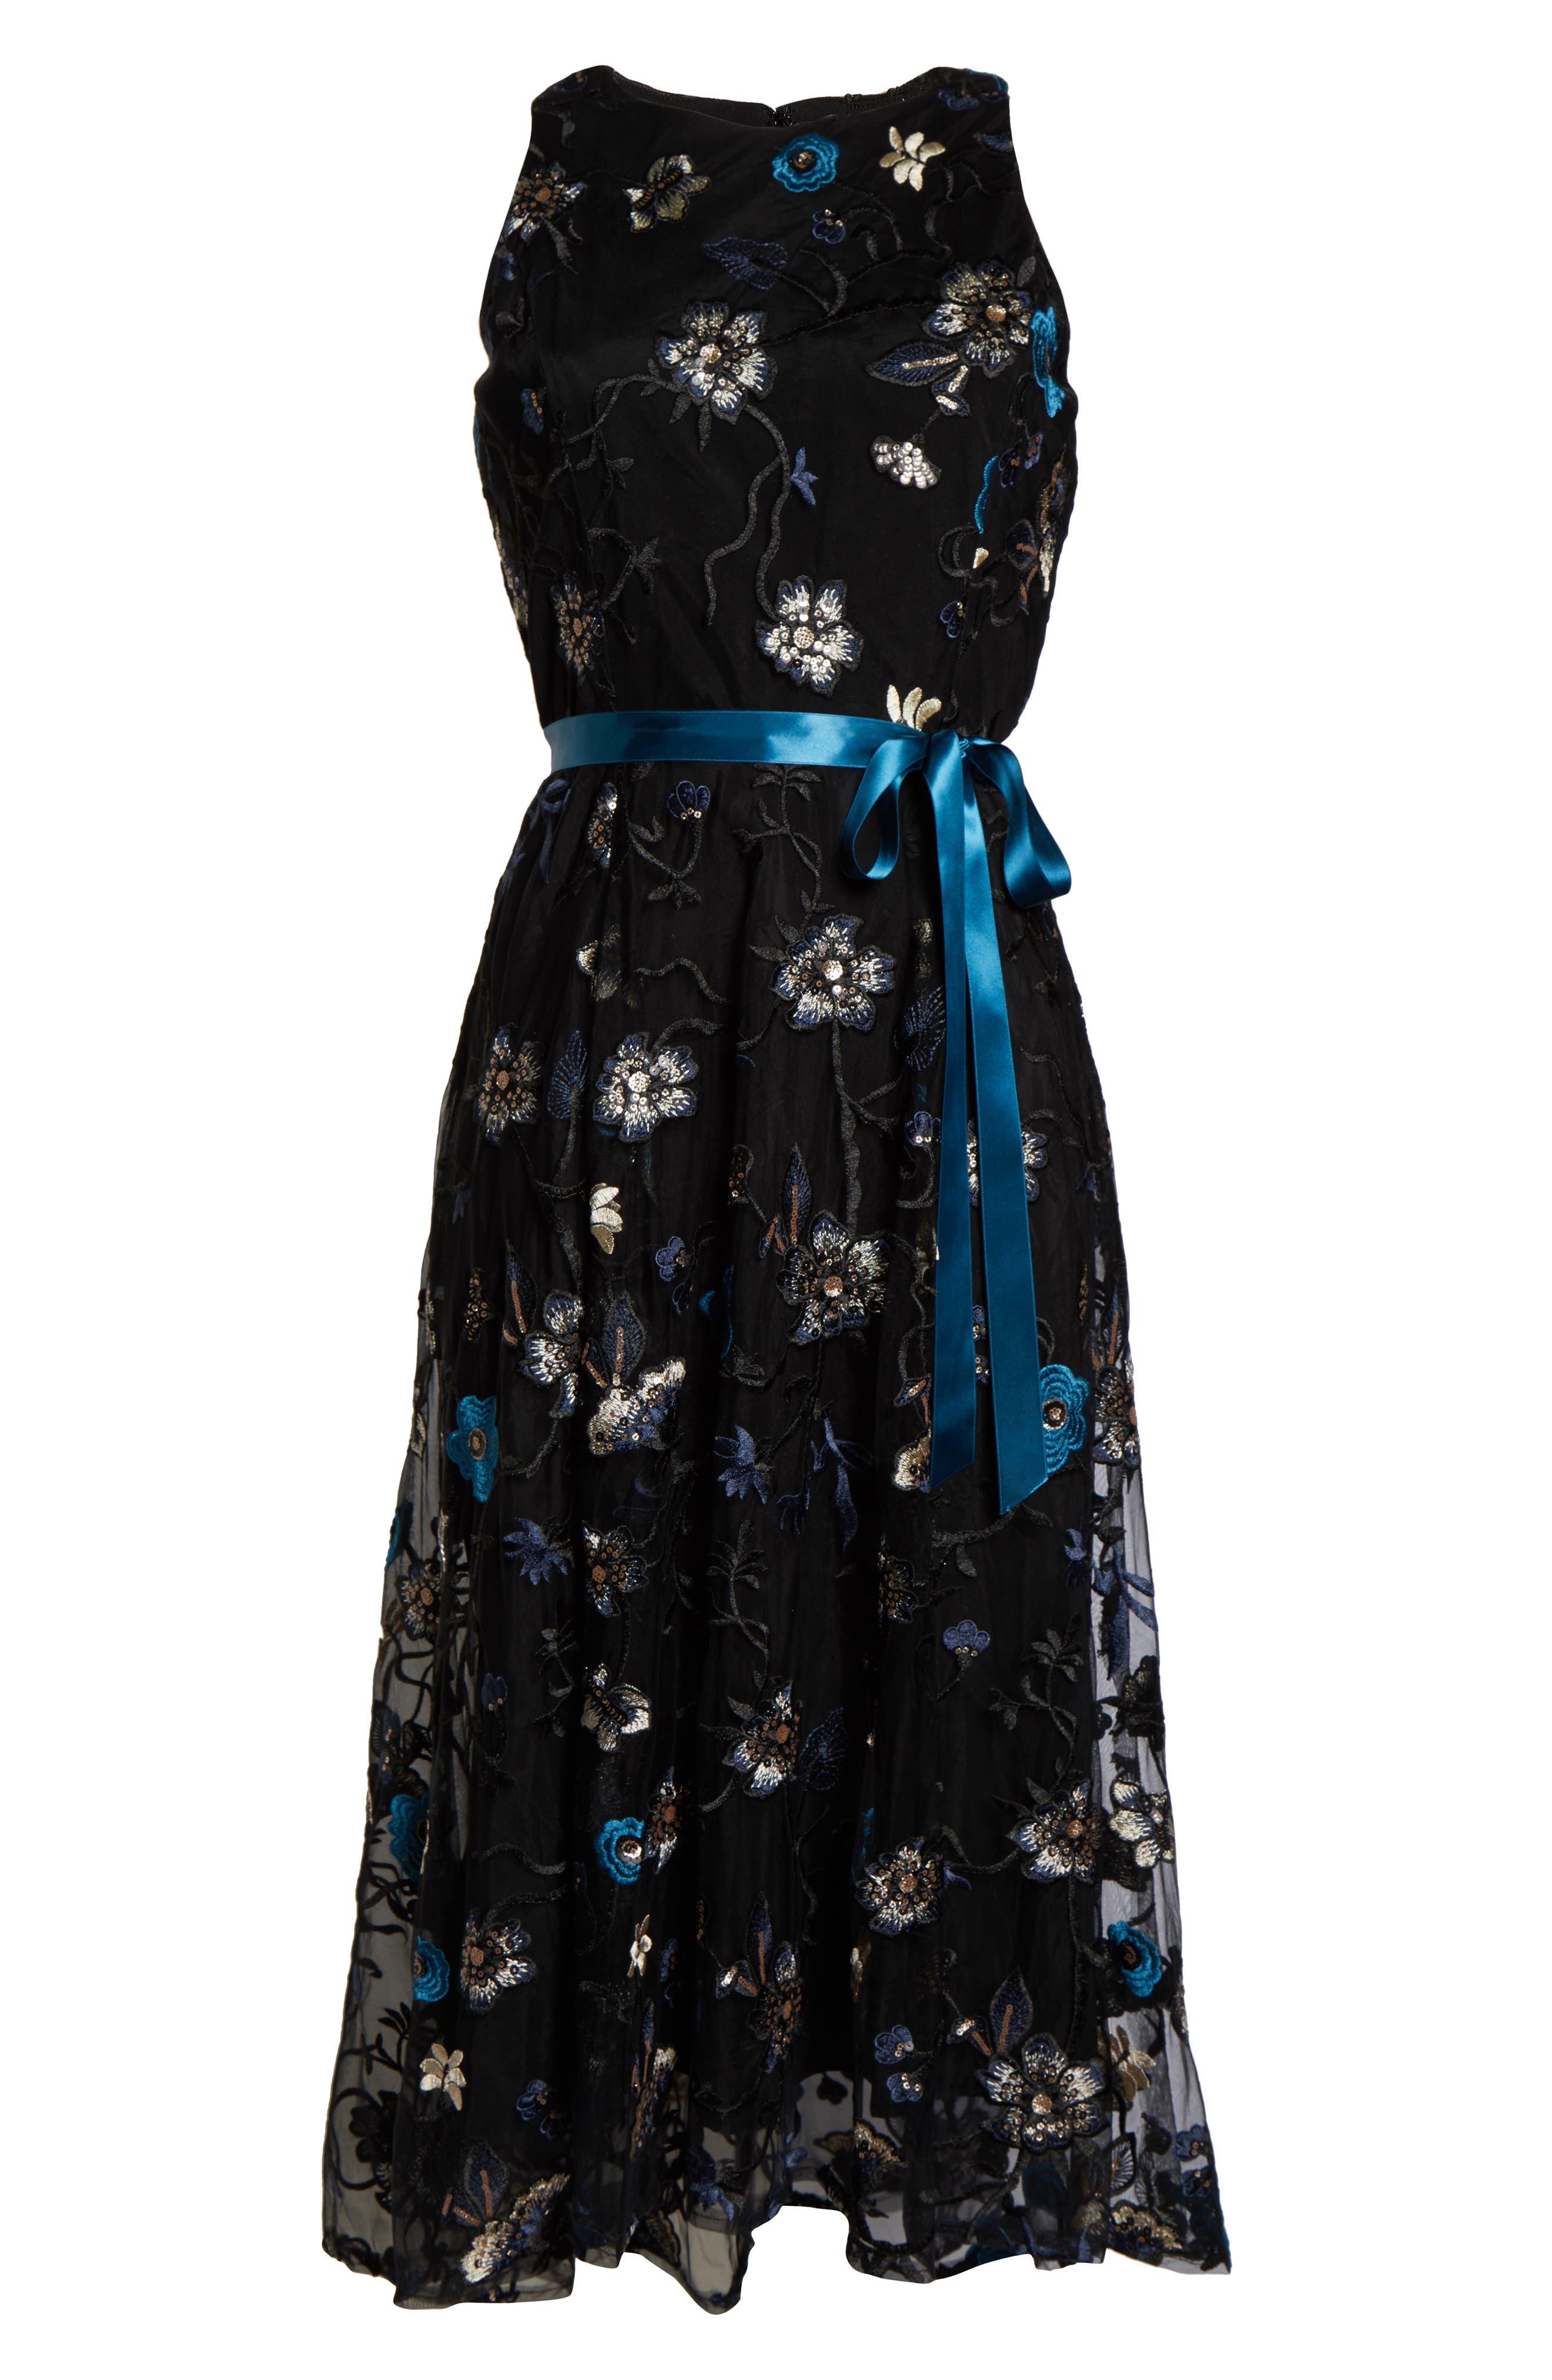 Tahari Dresses Floral Embroidered Mesh Midi Dress